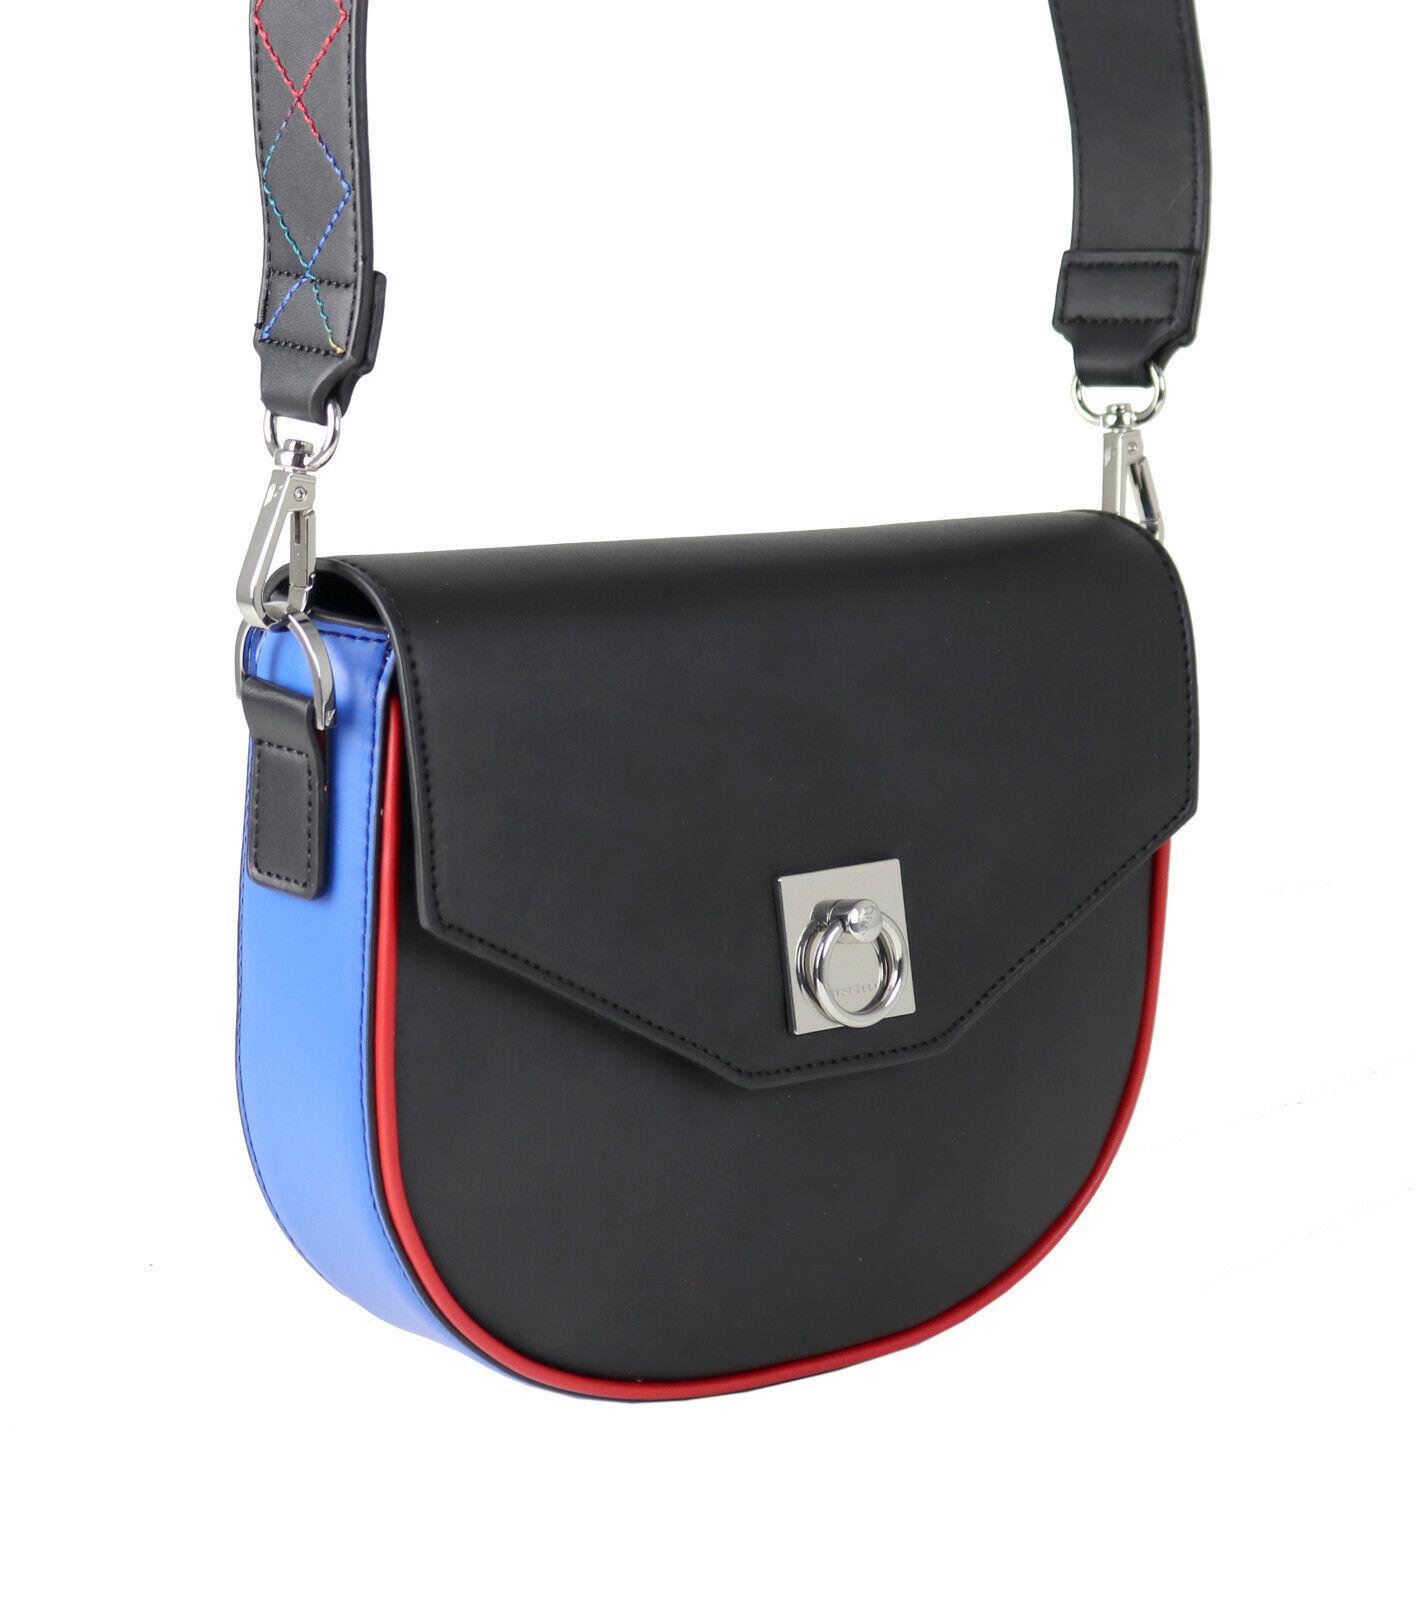 a287b86c5a687 Fiorelli Tasche Umhängetasche Fae Pop Saddle Saddle Saddle Bag FSH0132  Schwarz Rot Blau